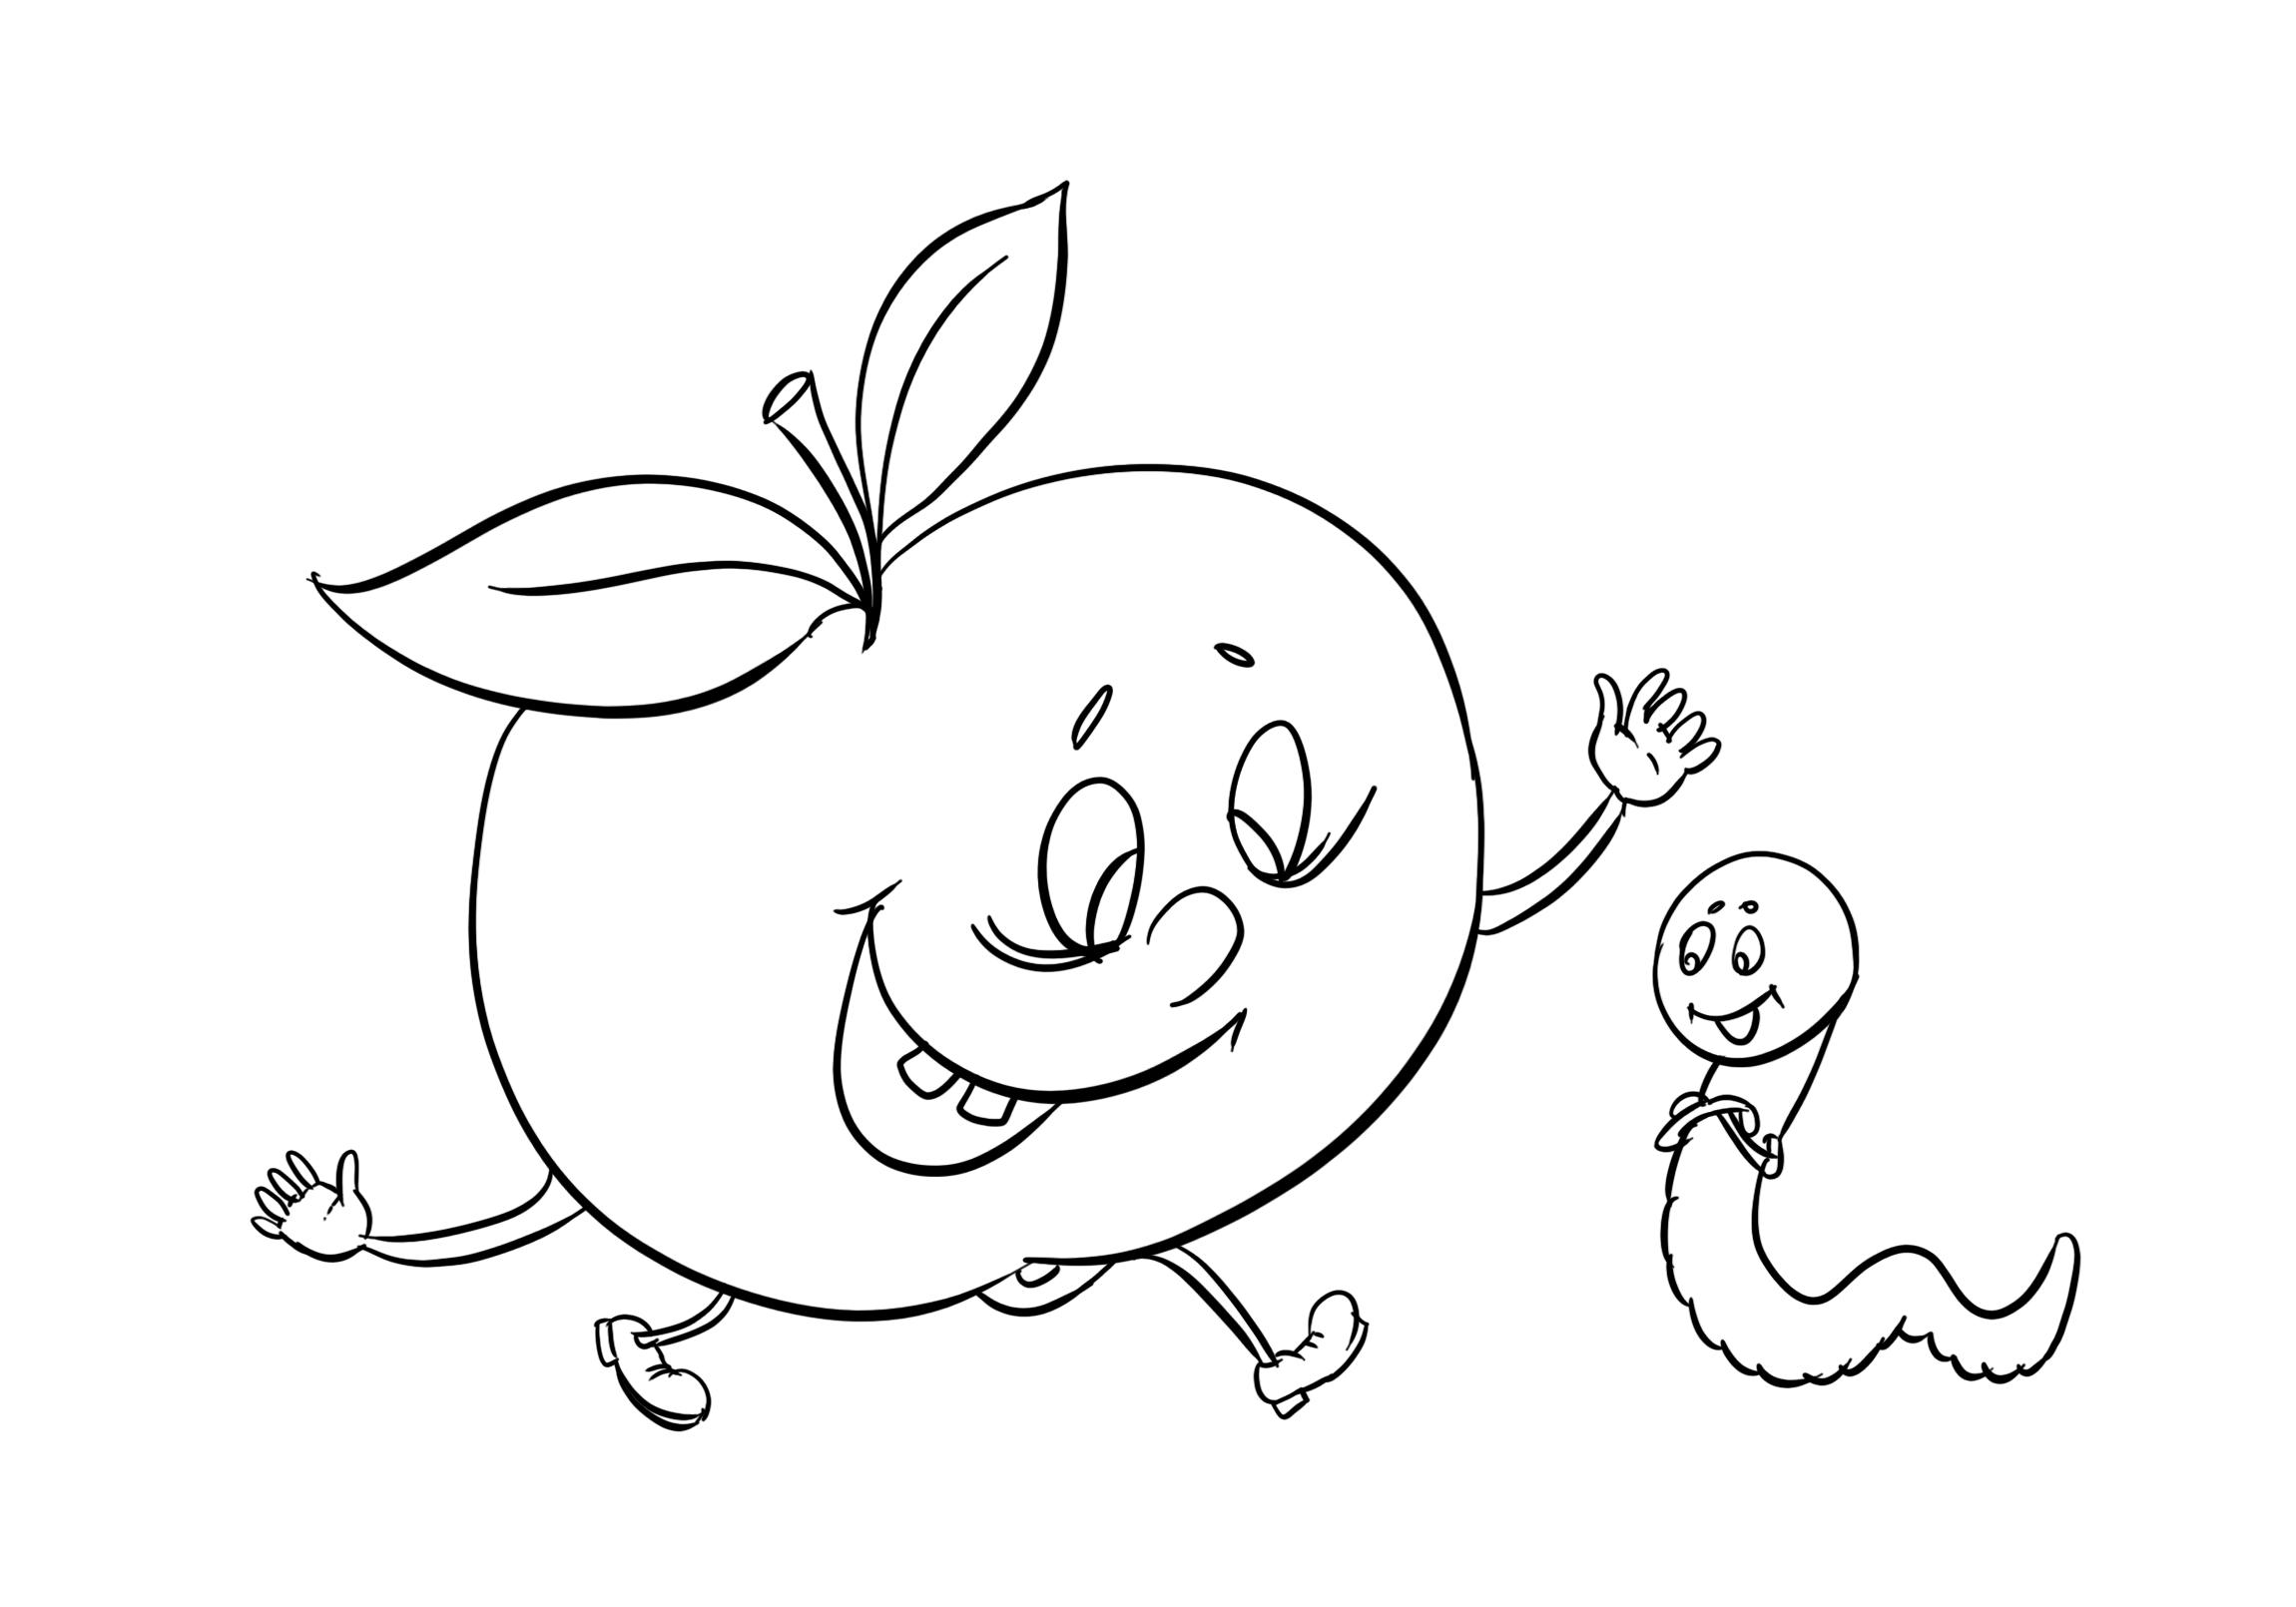 Ausmalbilder Apfel Vordruck Apfel Schablonen Zum Ausdrucken 1ausmalbilder Com Schablonen Zum Ausdrucken Ausmalbilder Ausmalen